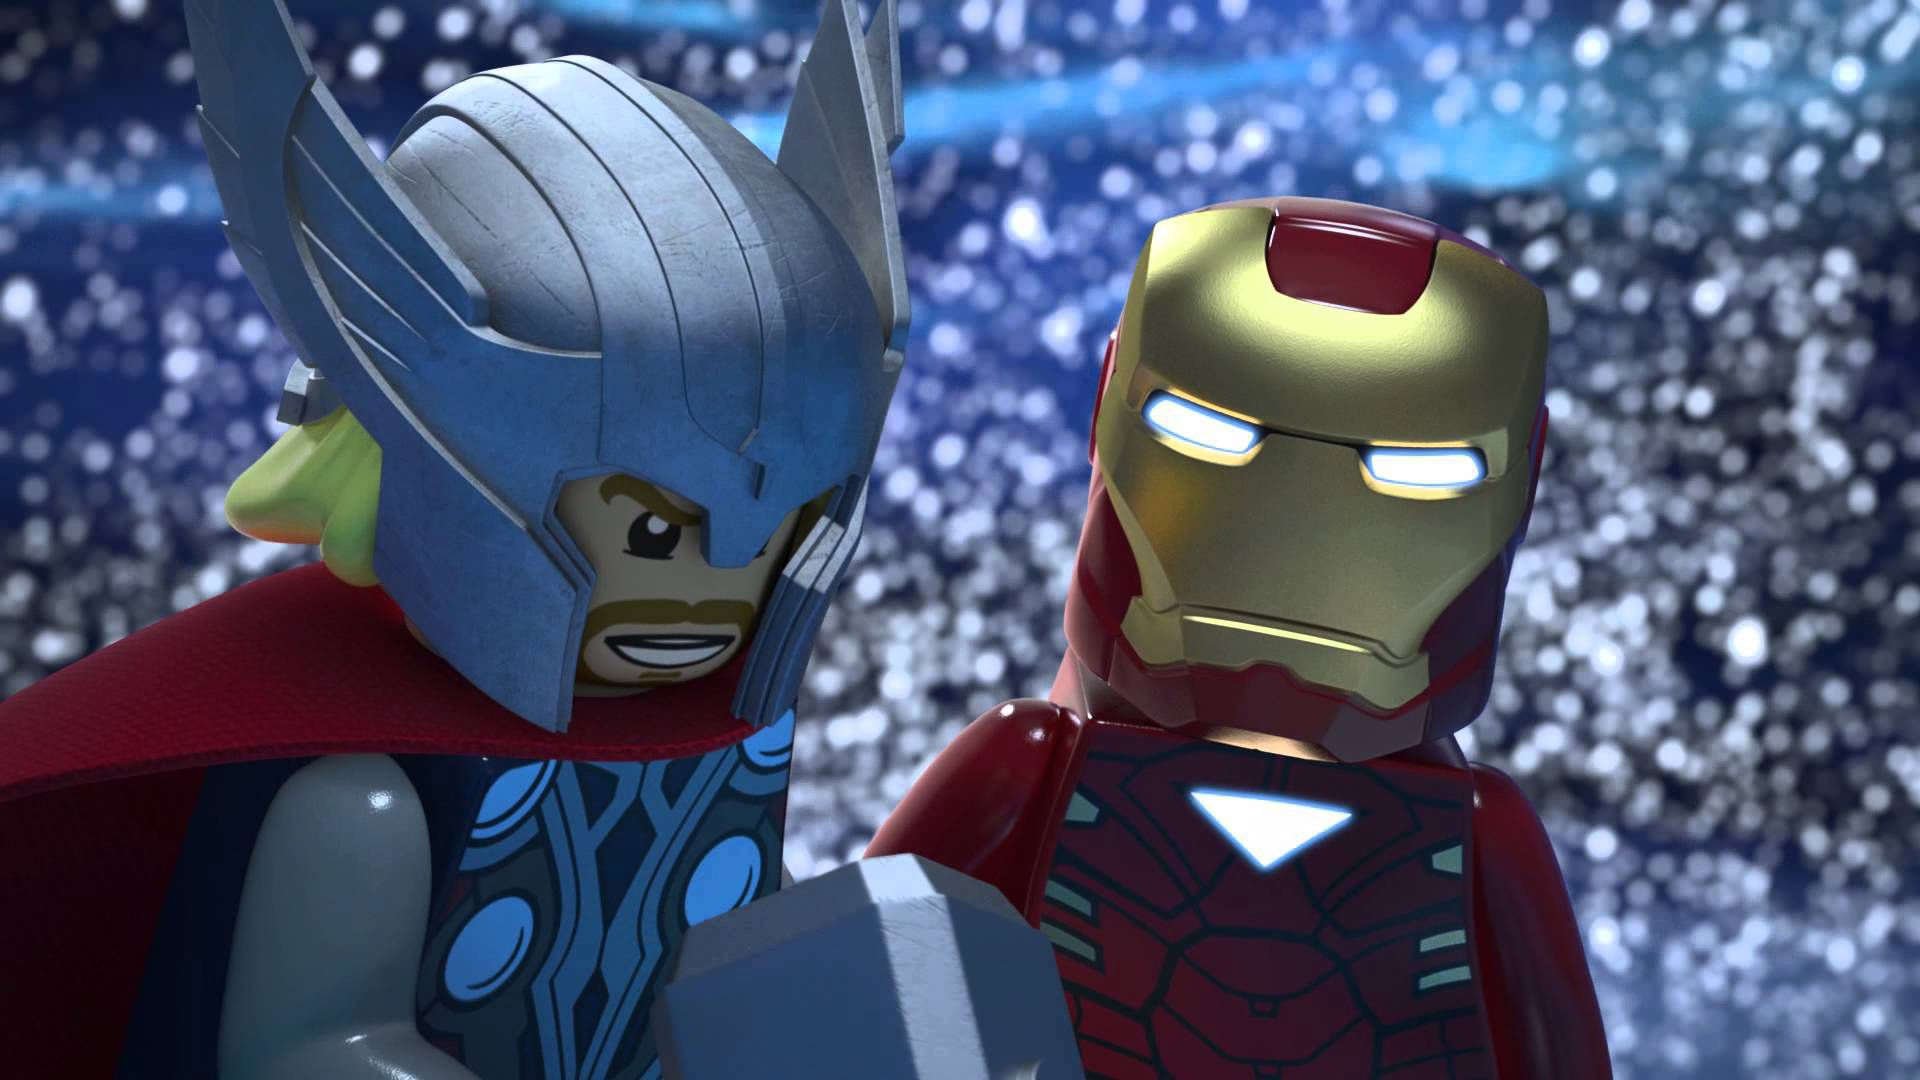 Marvel Super Heroes 60 Superhéroes: LEGO Marvel Super Heroes 2 Wallpapers Images Photos